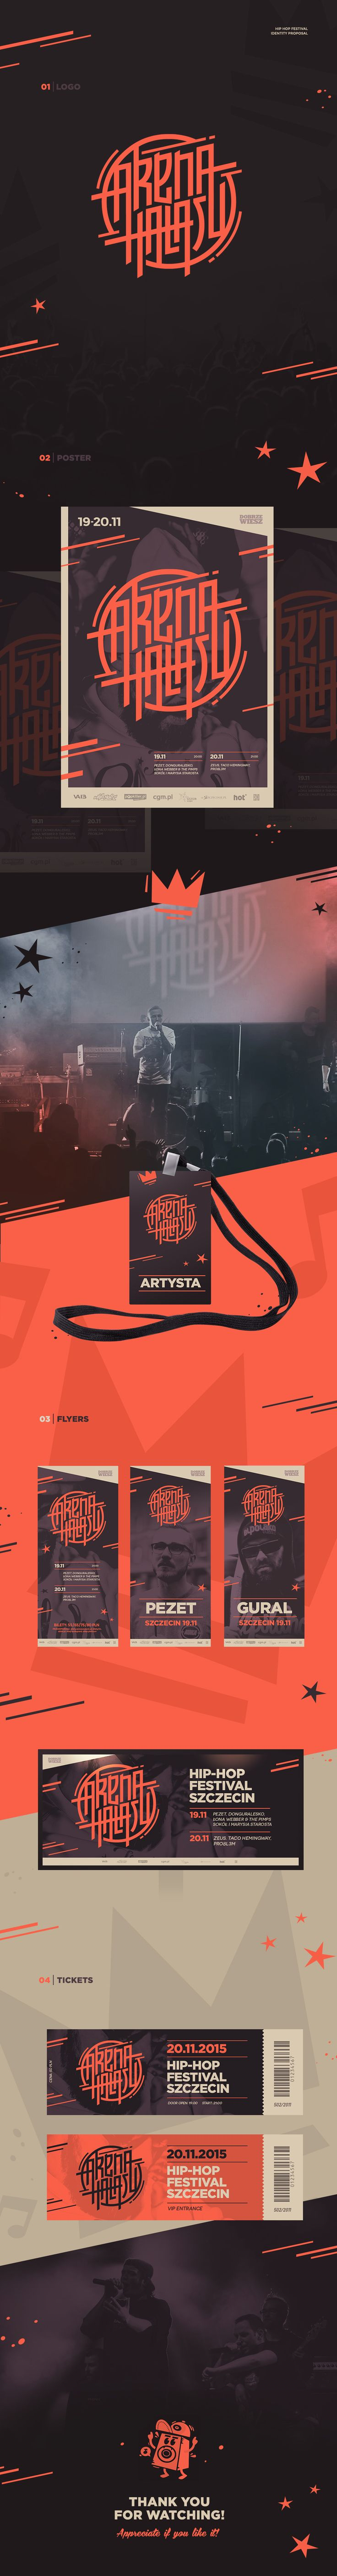 Arena Hałasu | hip-hop festival on Behance